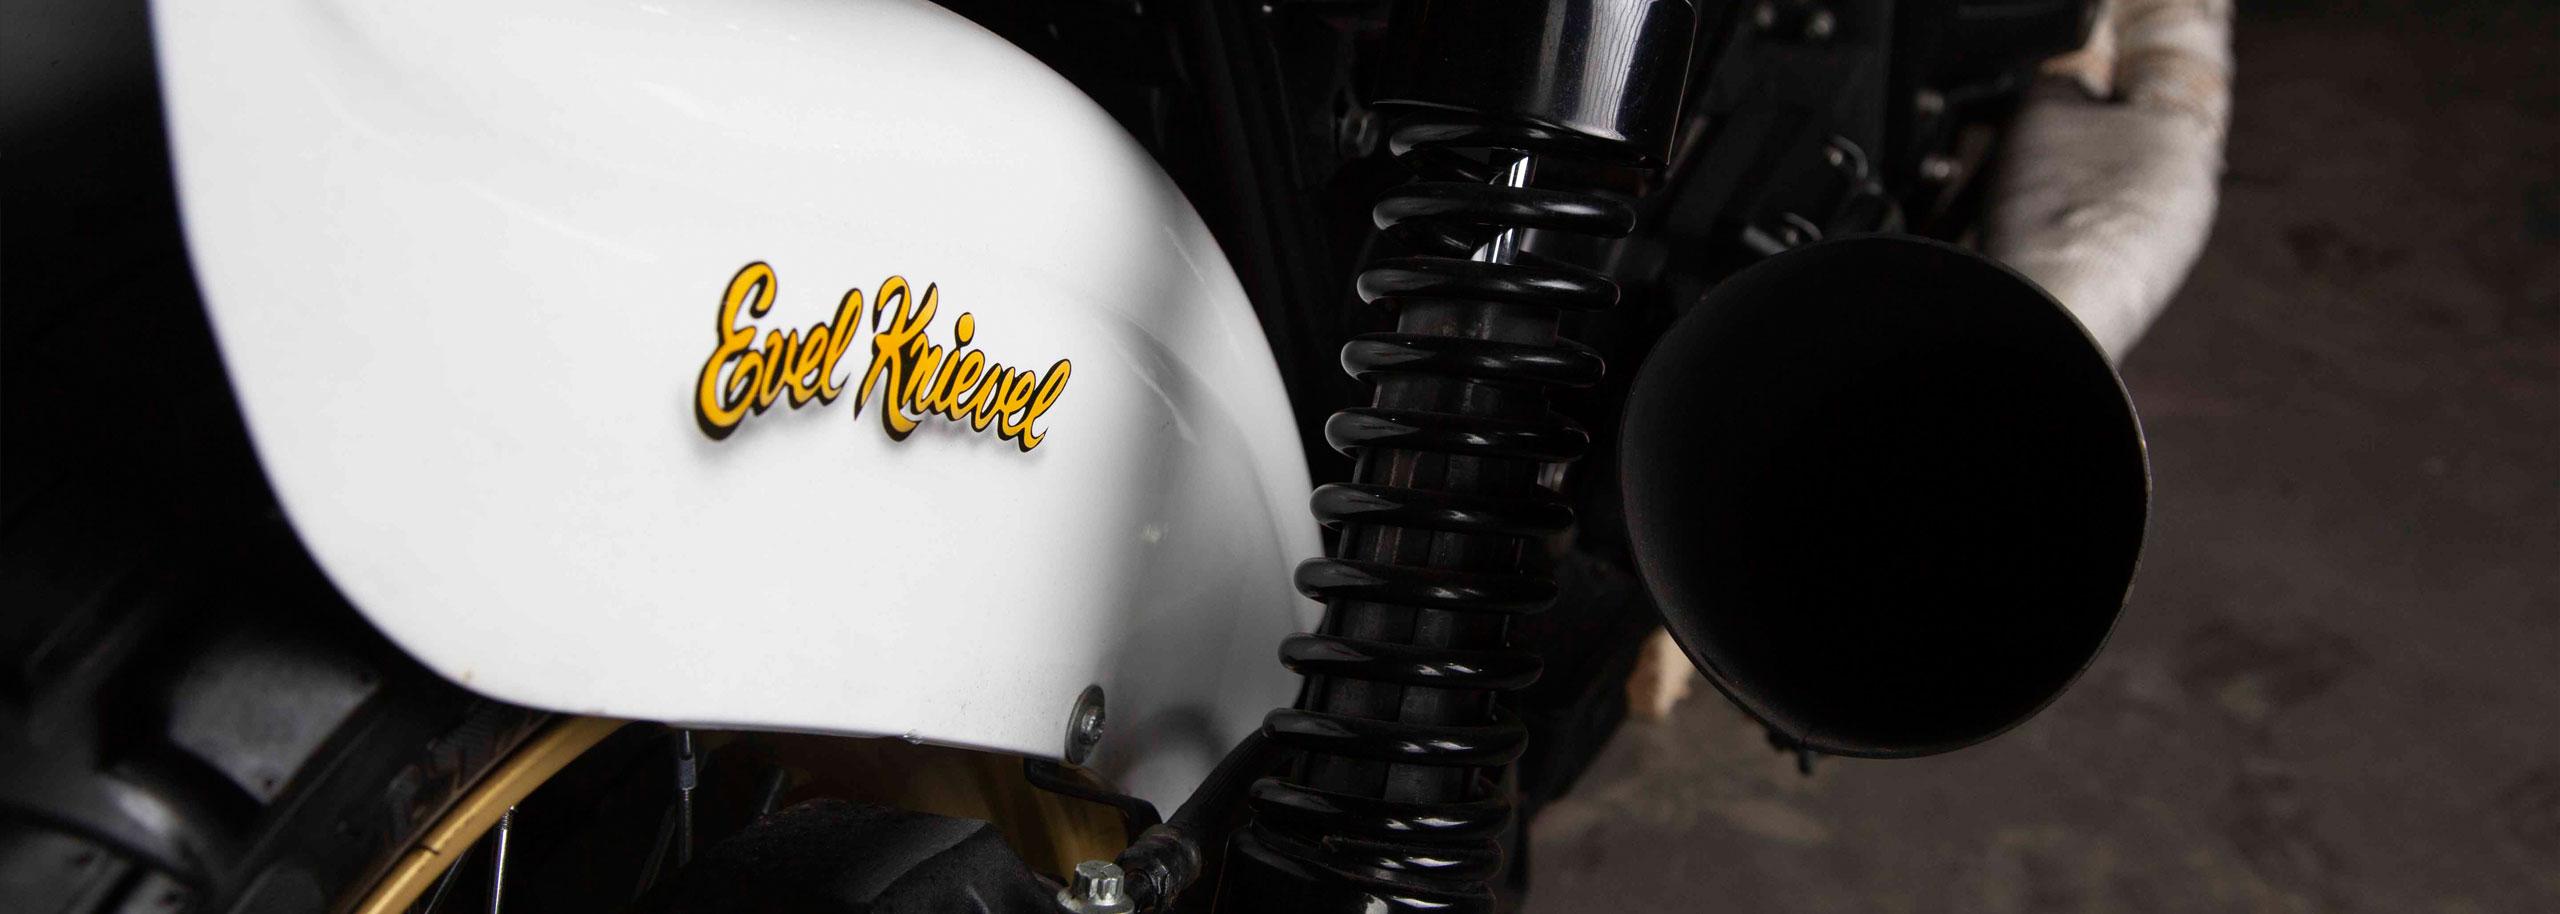 04_TITAN-Harley-Davidson-Dyna-Wide-Glide-Evel-Knievel_Harley-Umbau_Cafe-Racer-Graz-Motorrad-Umbau-Austria-Vintage_Custom-Bikes